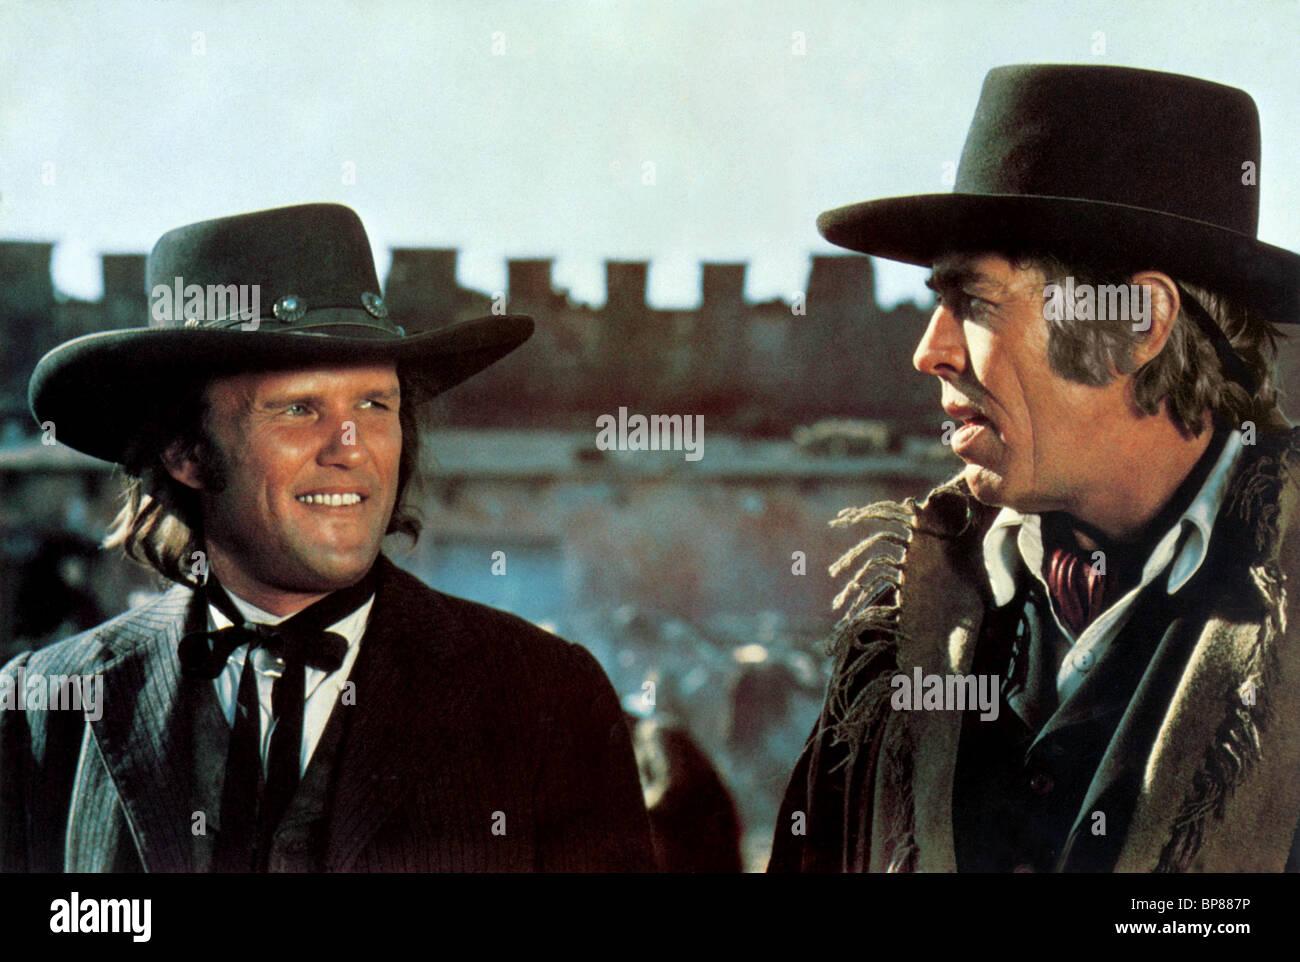 James Coburn Kris Kristofferson 8x12 photo Pat Garrett And Billy The Kid